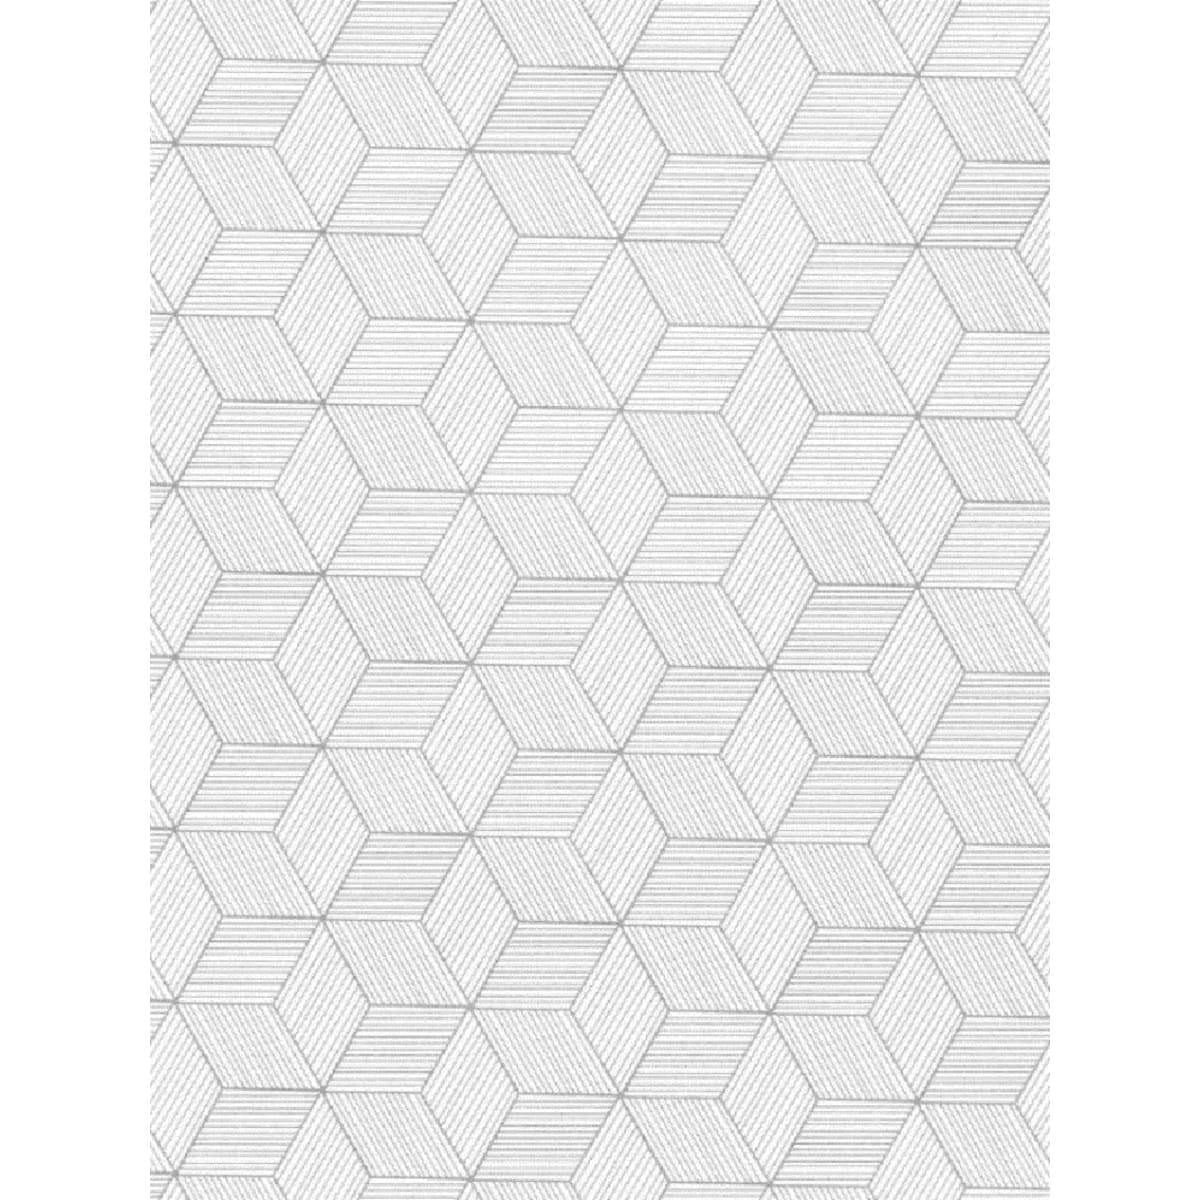 Декоративная самоклеящаяся пленка Color Decor 6005х24 (0,45)